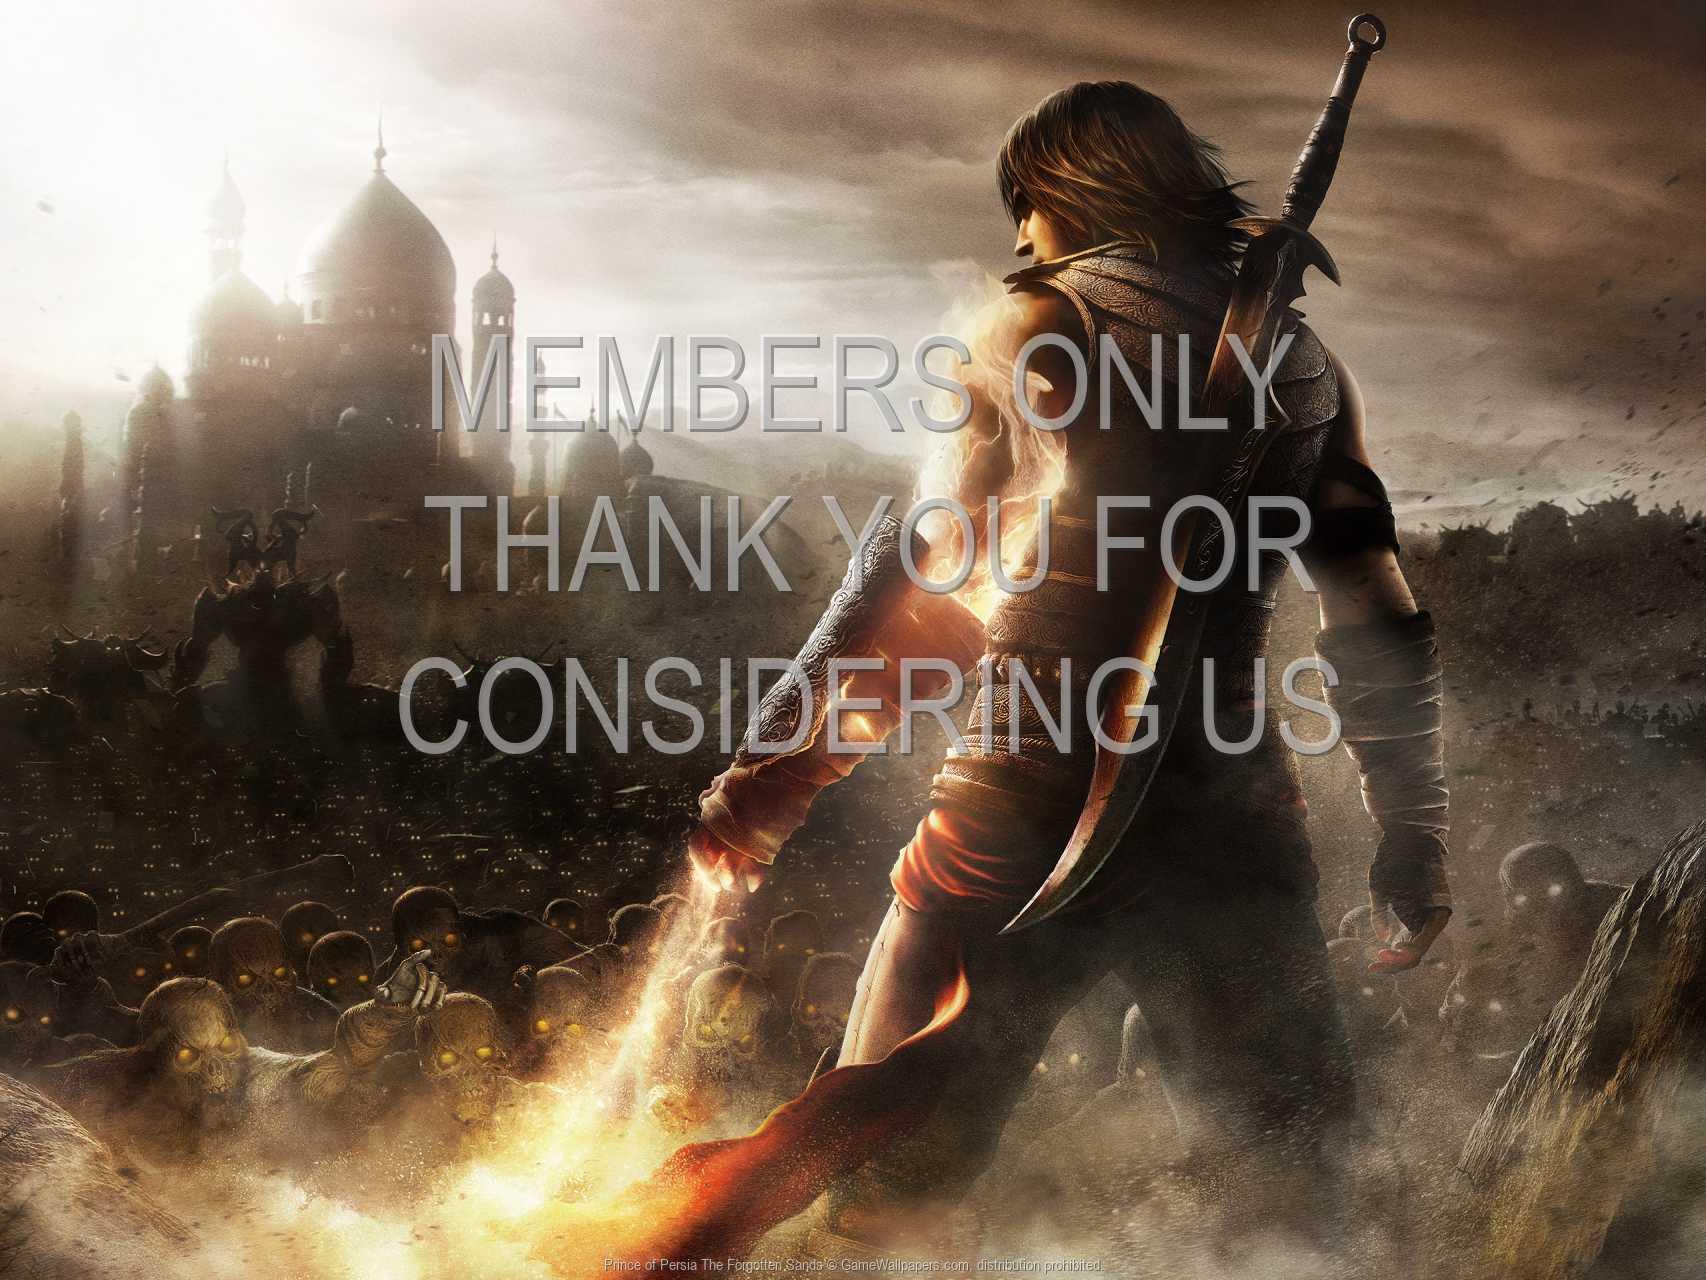 Prince of Persia: The Forgotten Sands 720p Horizontal Handy Hintergrundbild 05